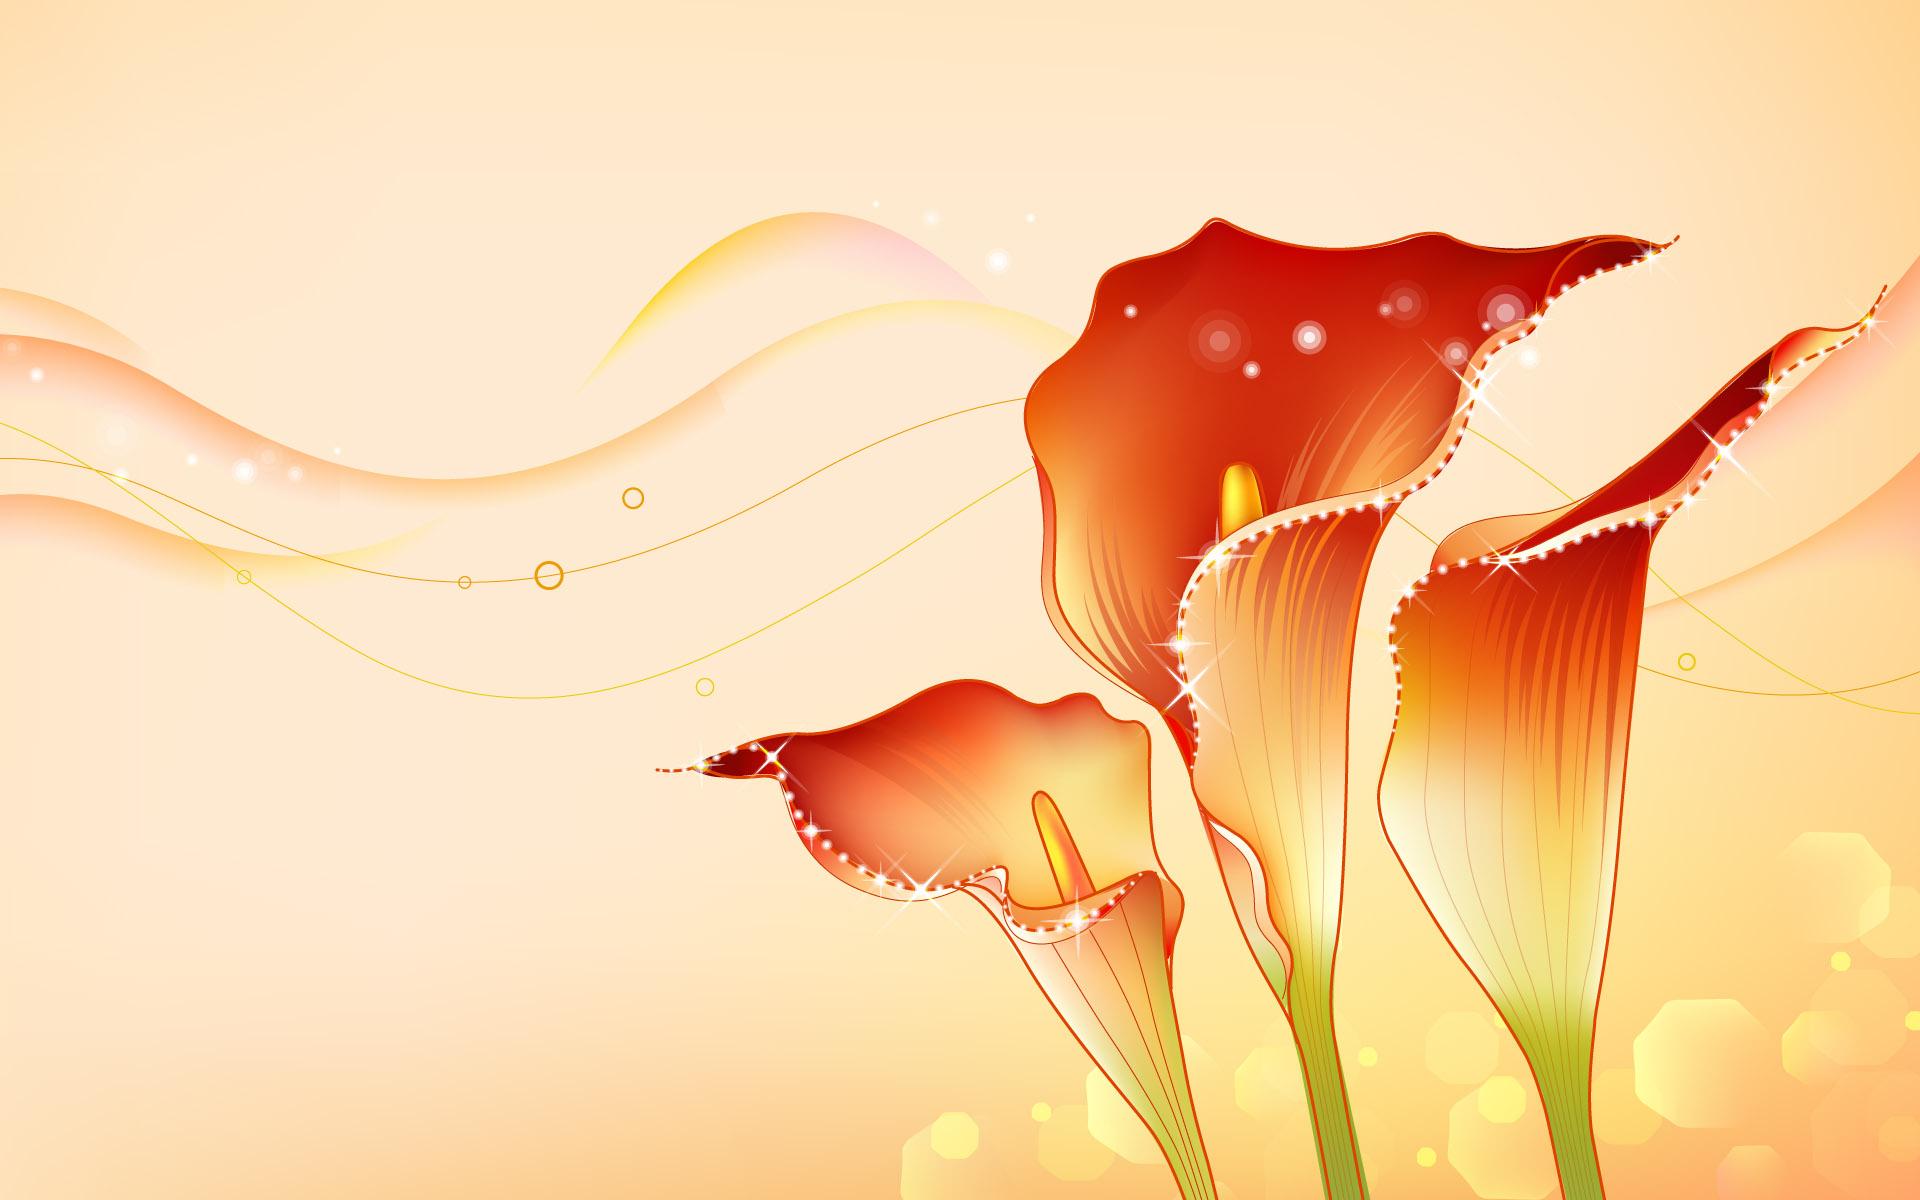 Wallpaper With Flower Designs Wallpapersafari